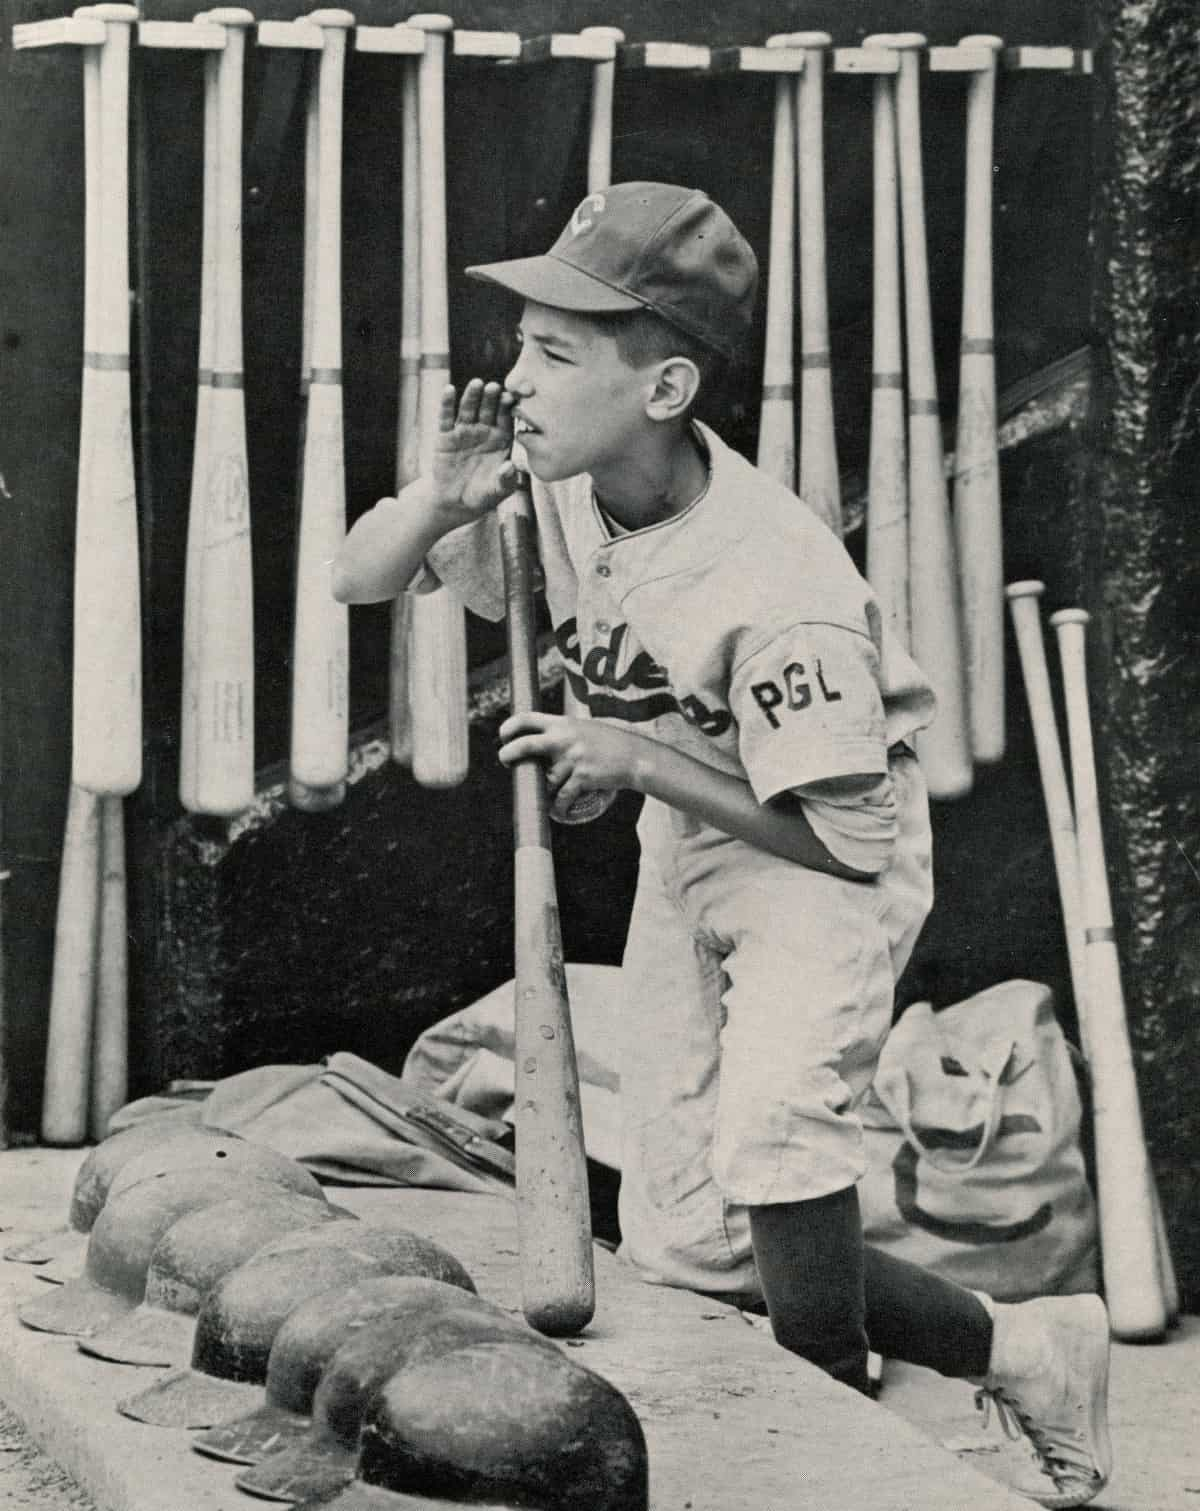 1962-Brooklyn-Cadets-batboy-Frank-Compiso-age-12